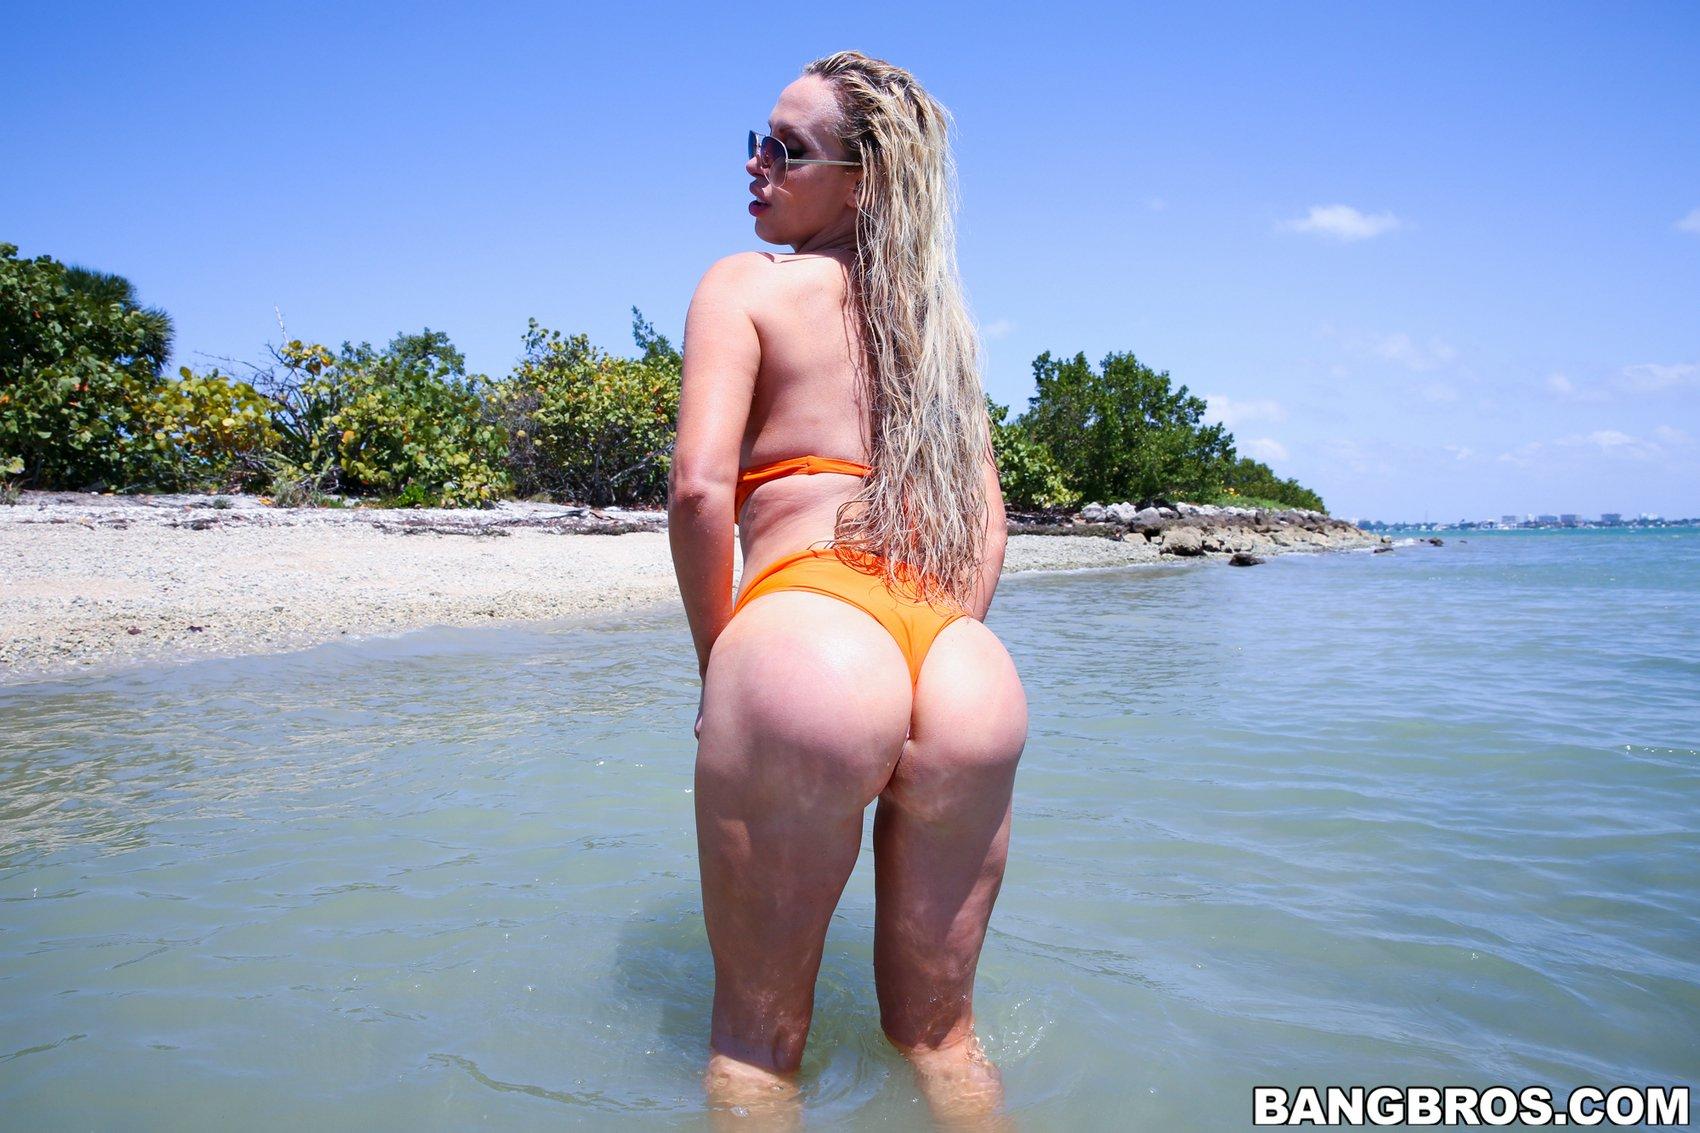 Nikki bikini off